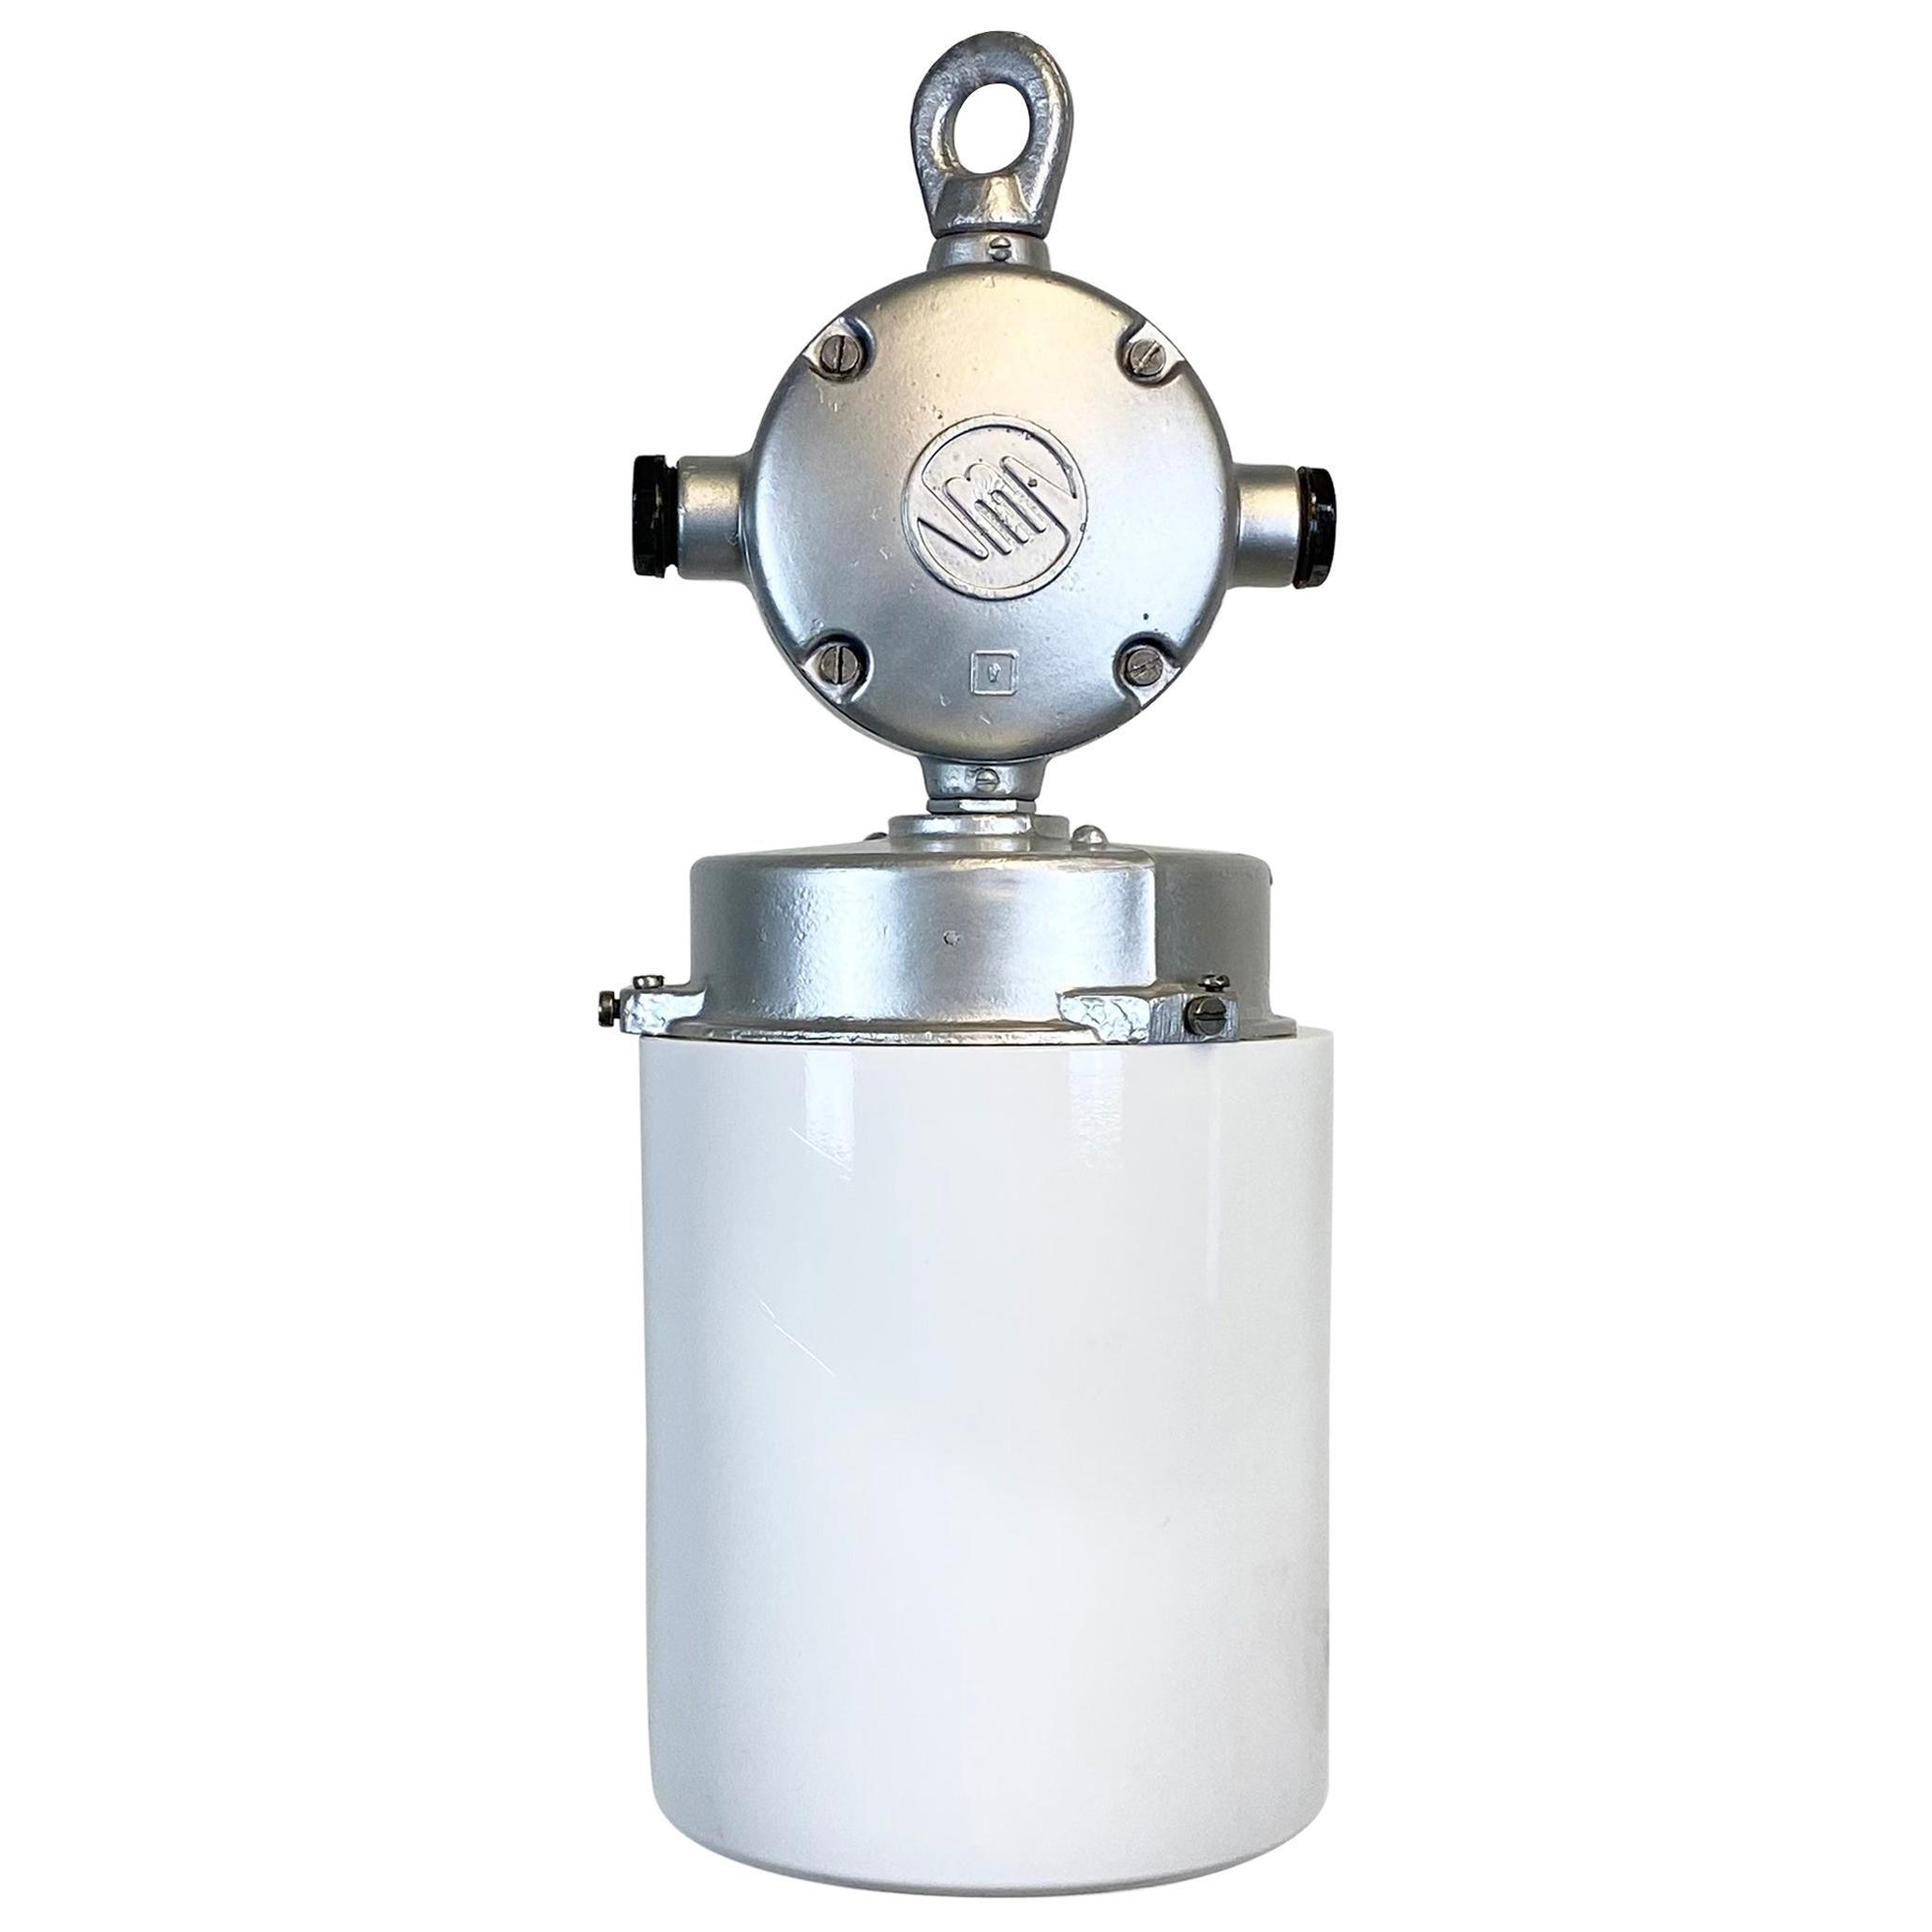 Vintage Aluminium Industrial Lamp with Milk Glass, 1970s